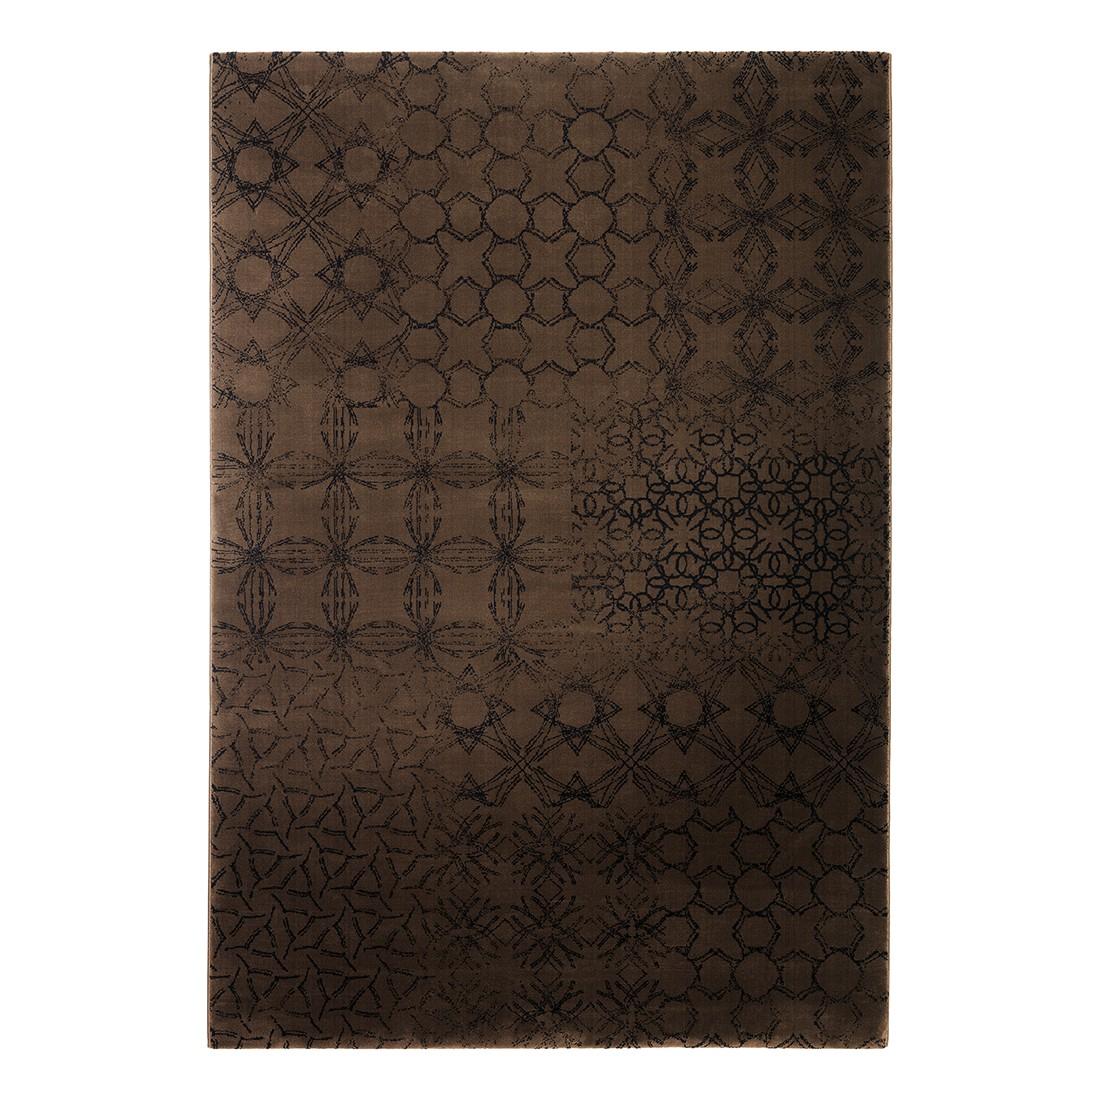 Teppich Hamptons – Braun – 120 cm x 180 cm, Esprit Home günstig